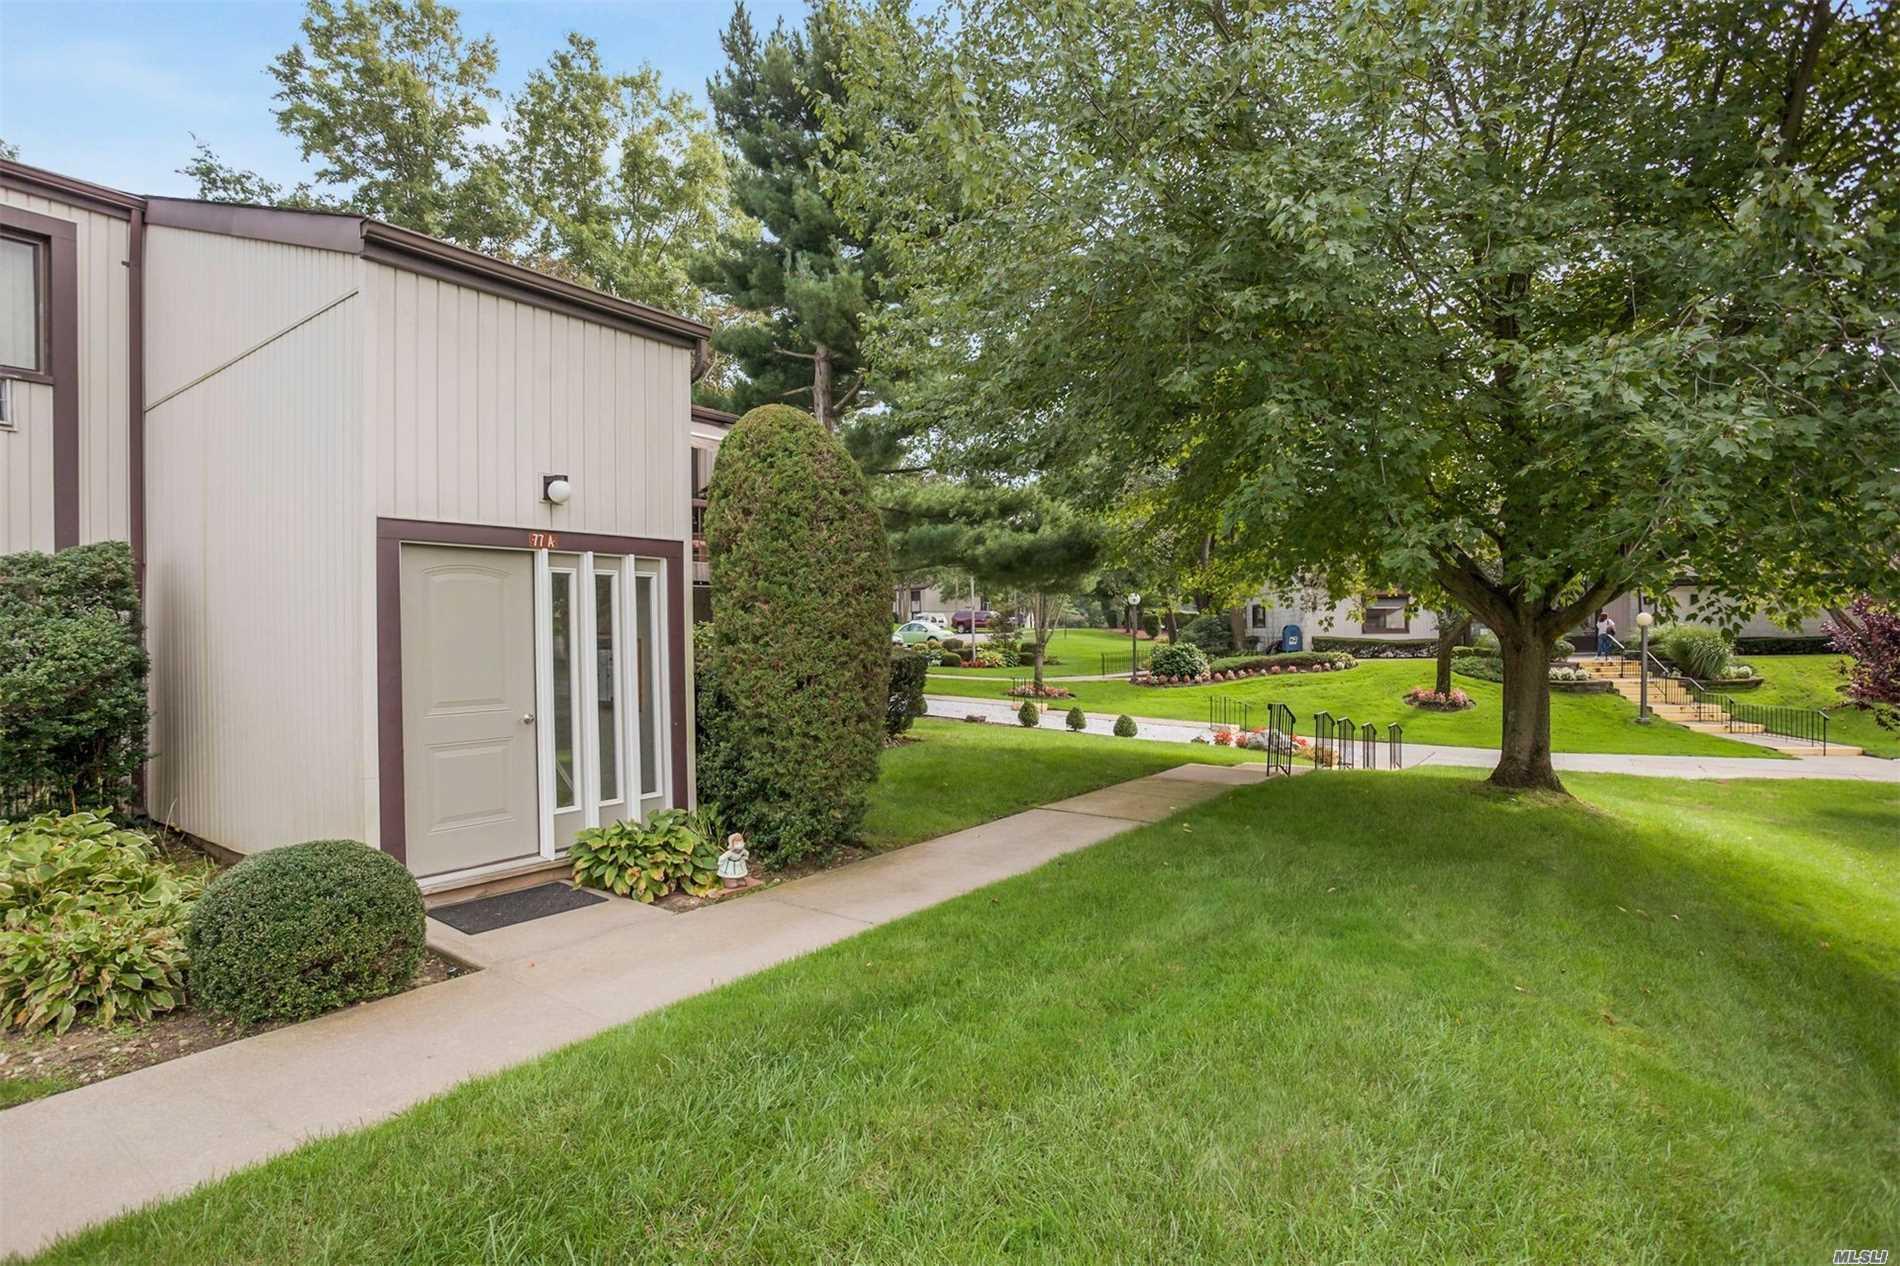 Property for sale at 77 Richmond Blvd, Ronkonkoma,  NY 11779